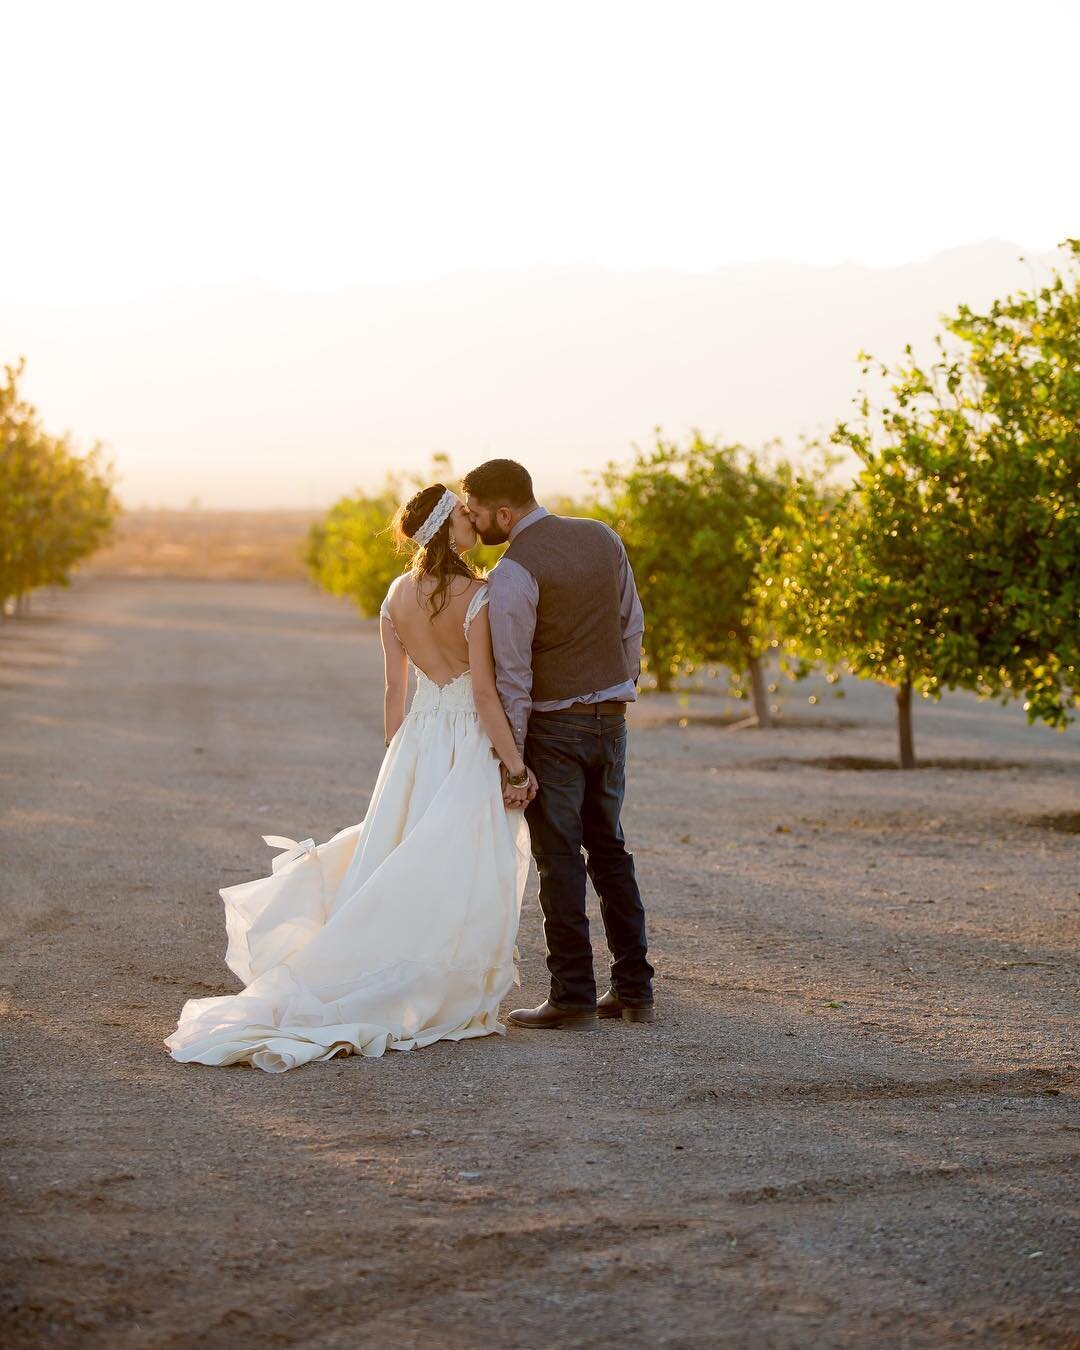 Bride and groom vineyard wedding with custom made vintage backless wedding dress.jpg